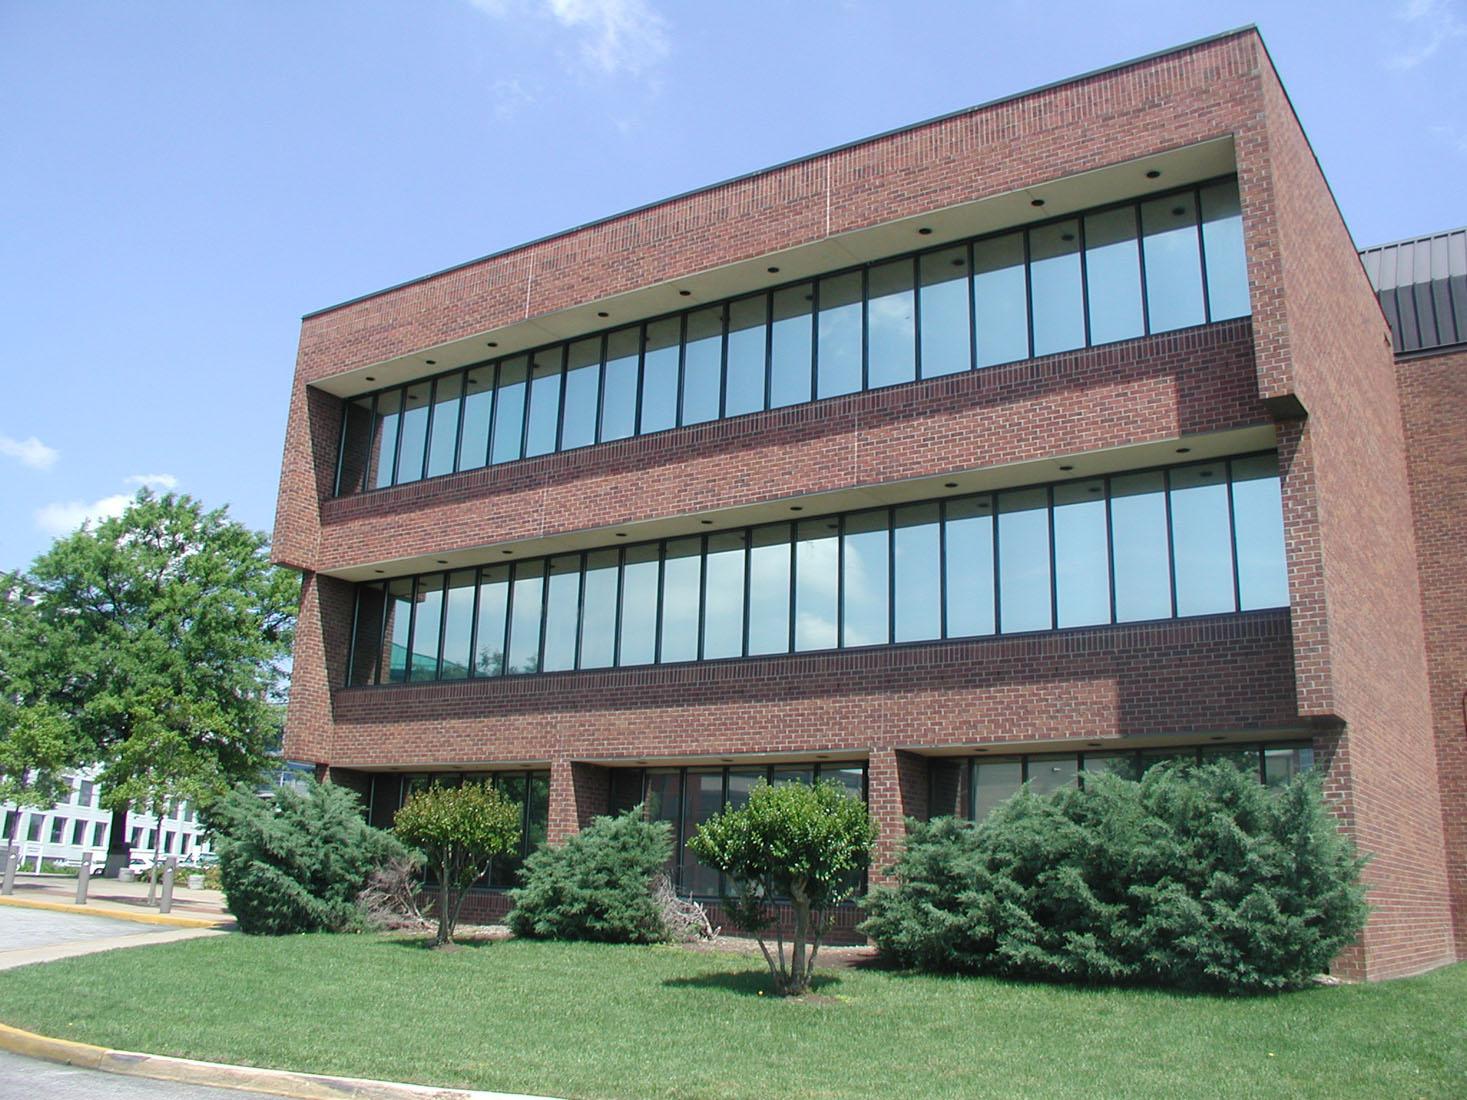 Virginia Education Loan Authority